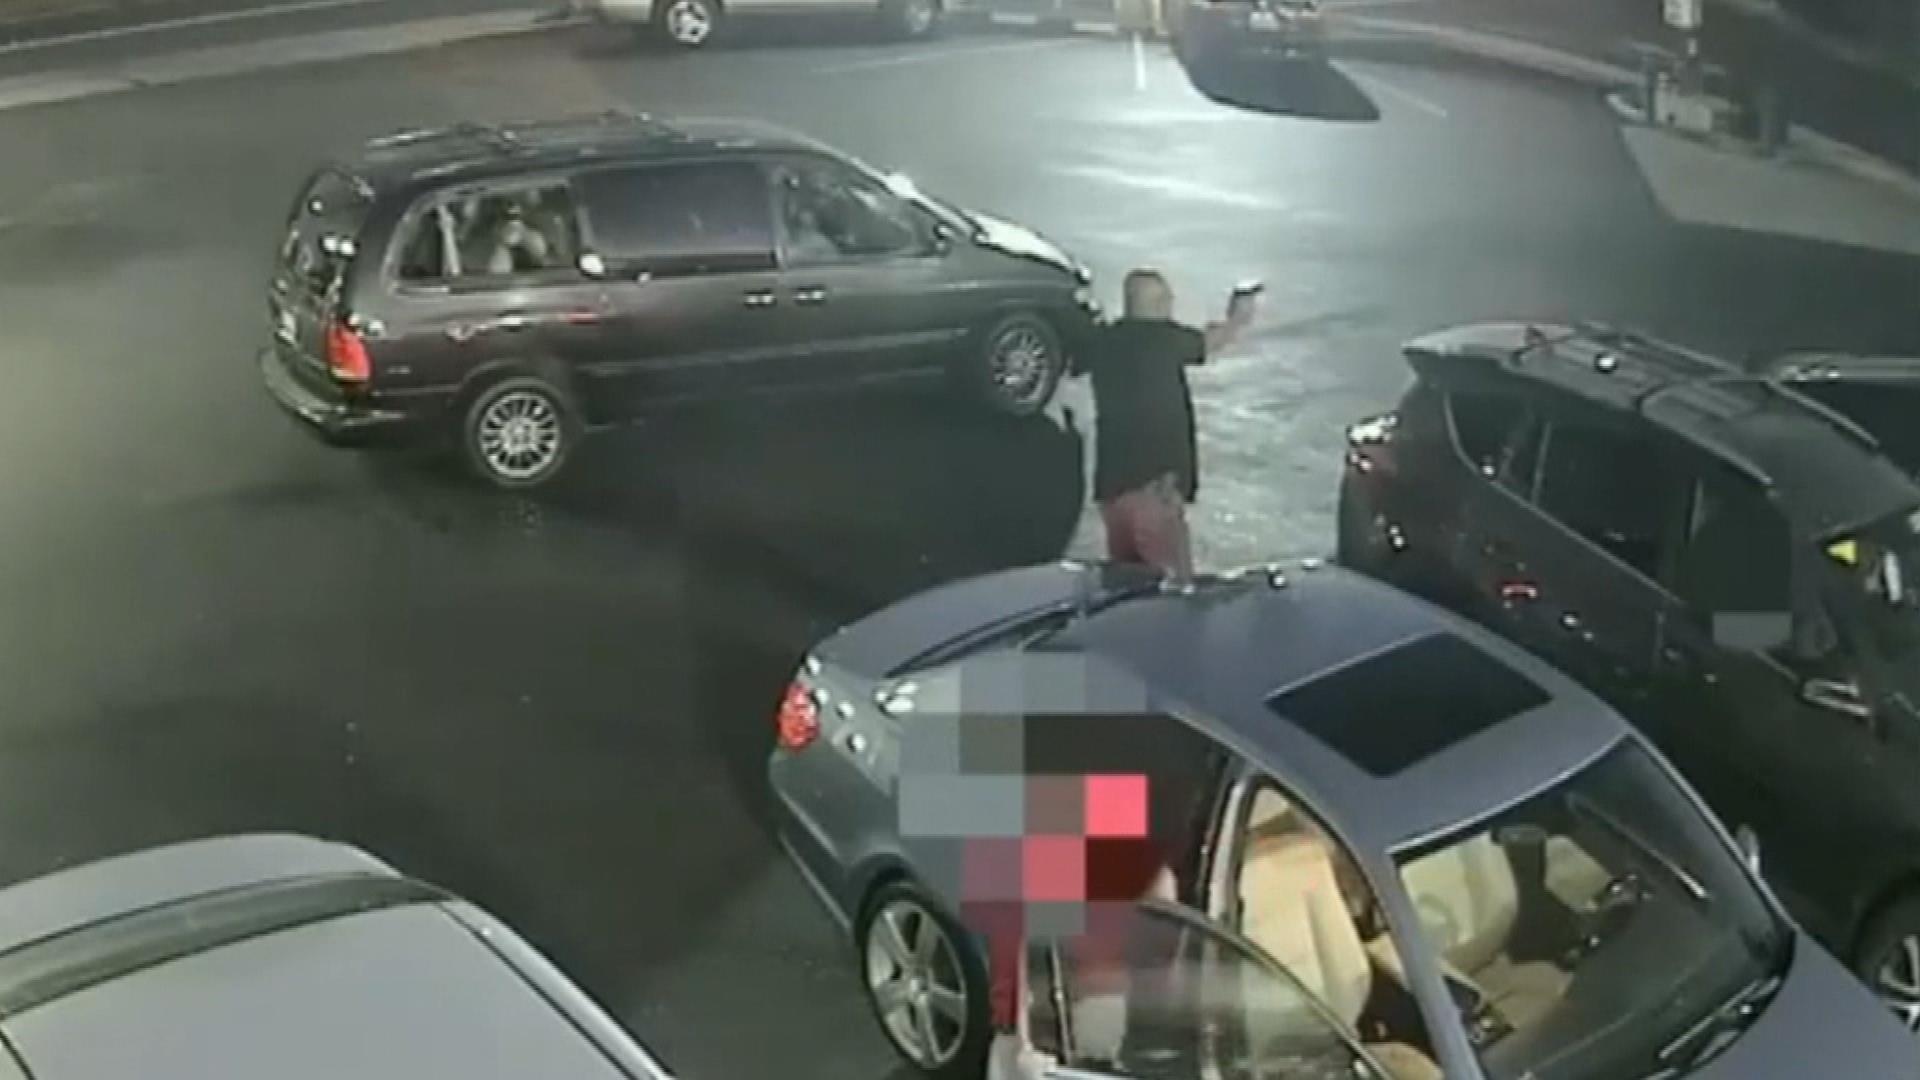 During heated parking lot dispute, off-duty officer fatally shoots man running away